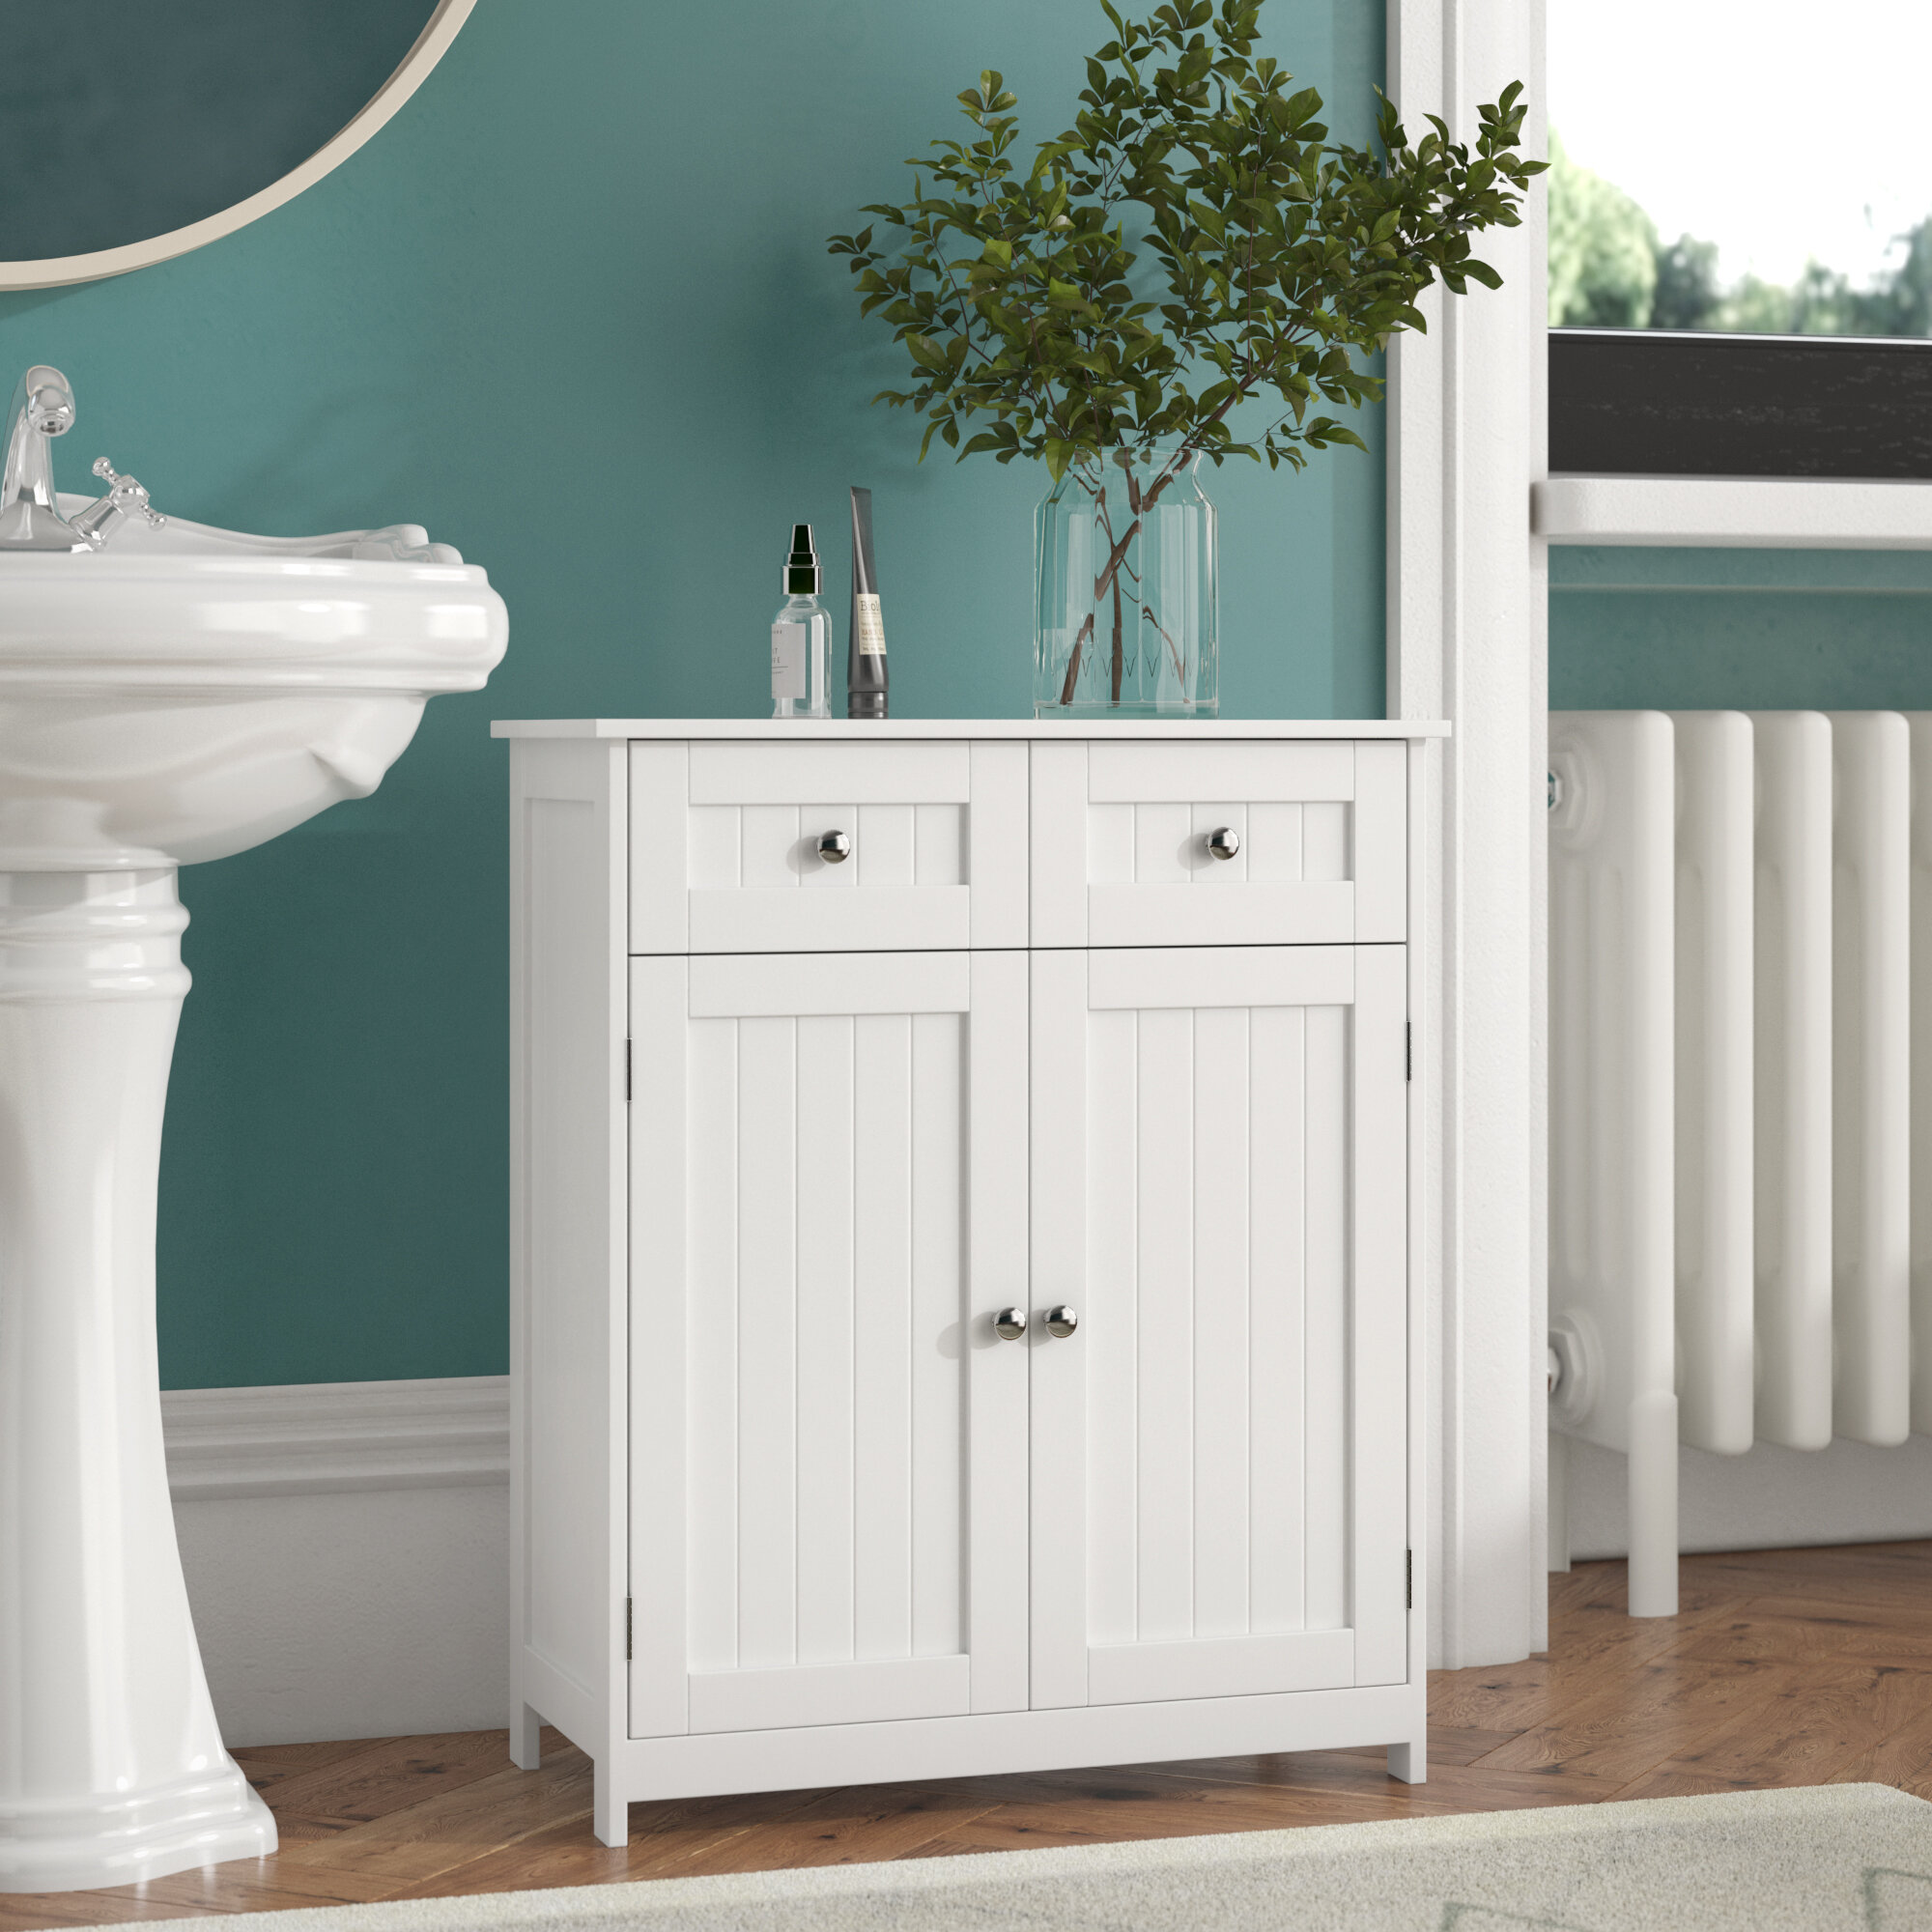 184a1f9cd5ec Wildon Home Vida Priano 60 x 75cm Free Standing Cabinet & Reviews    Wayfair.co.uk